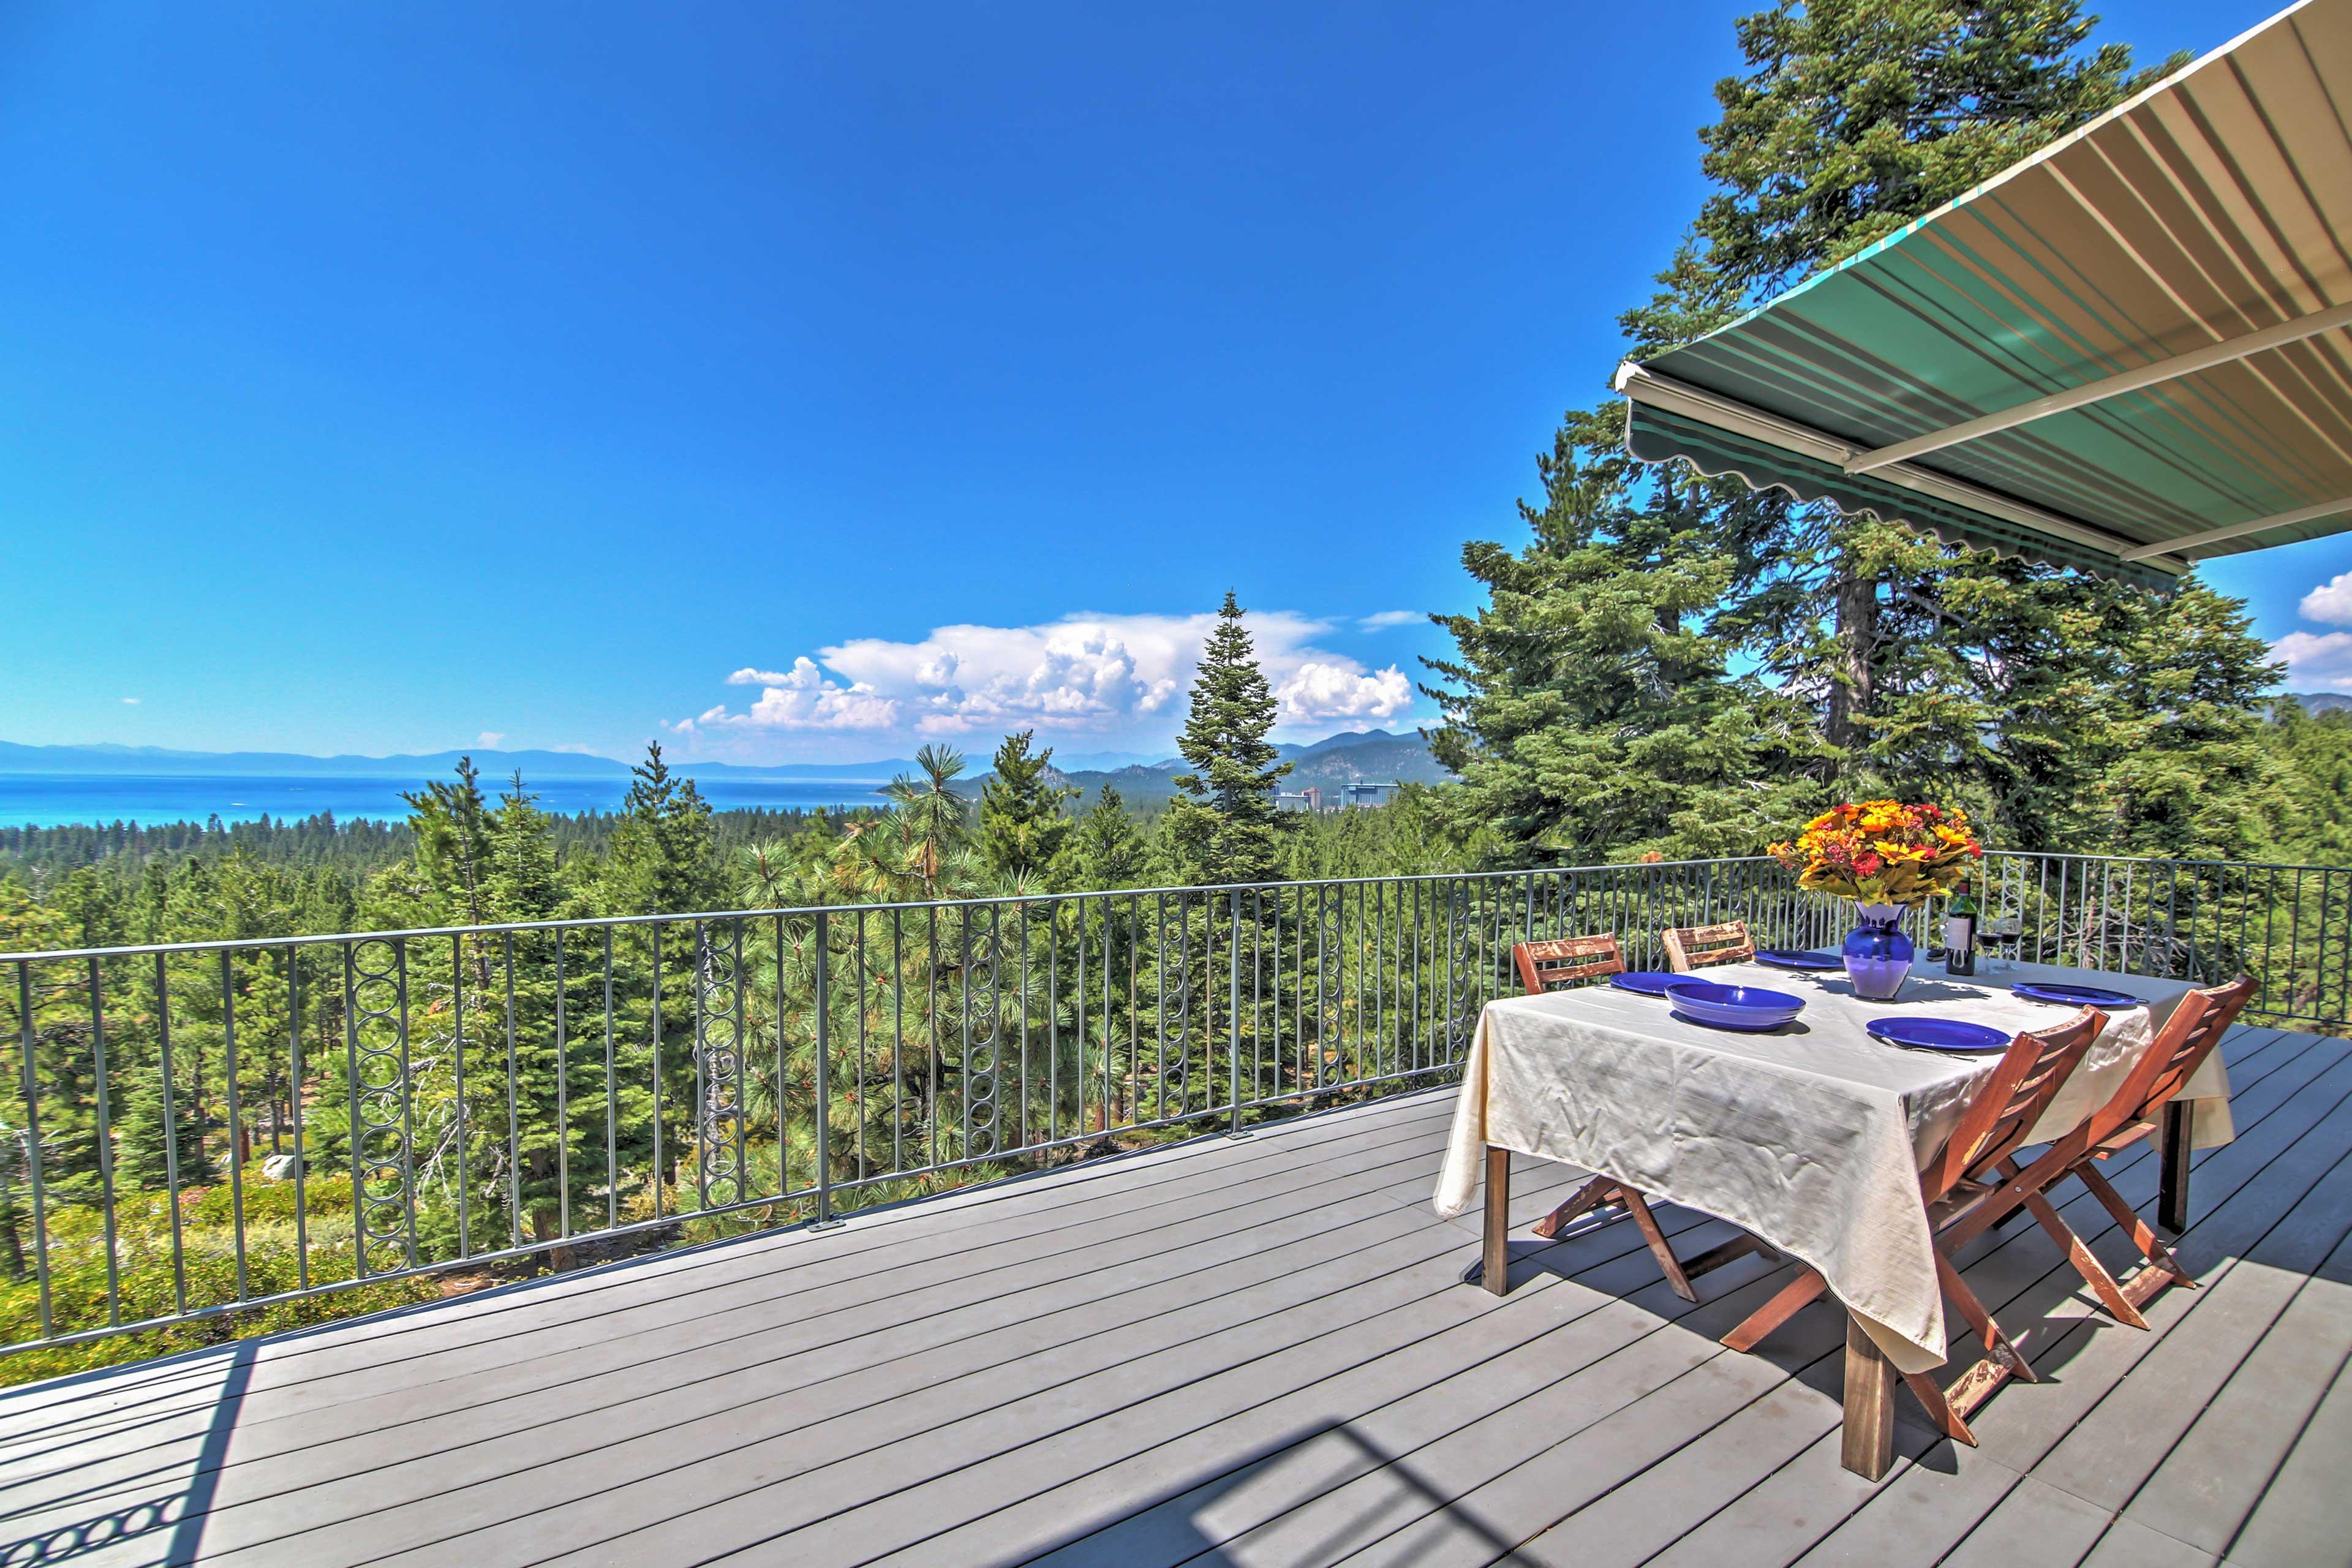 South Lake Tahoe Vacation Rental   4BR   3BA   3,700 Sq Ft   2 Stories